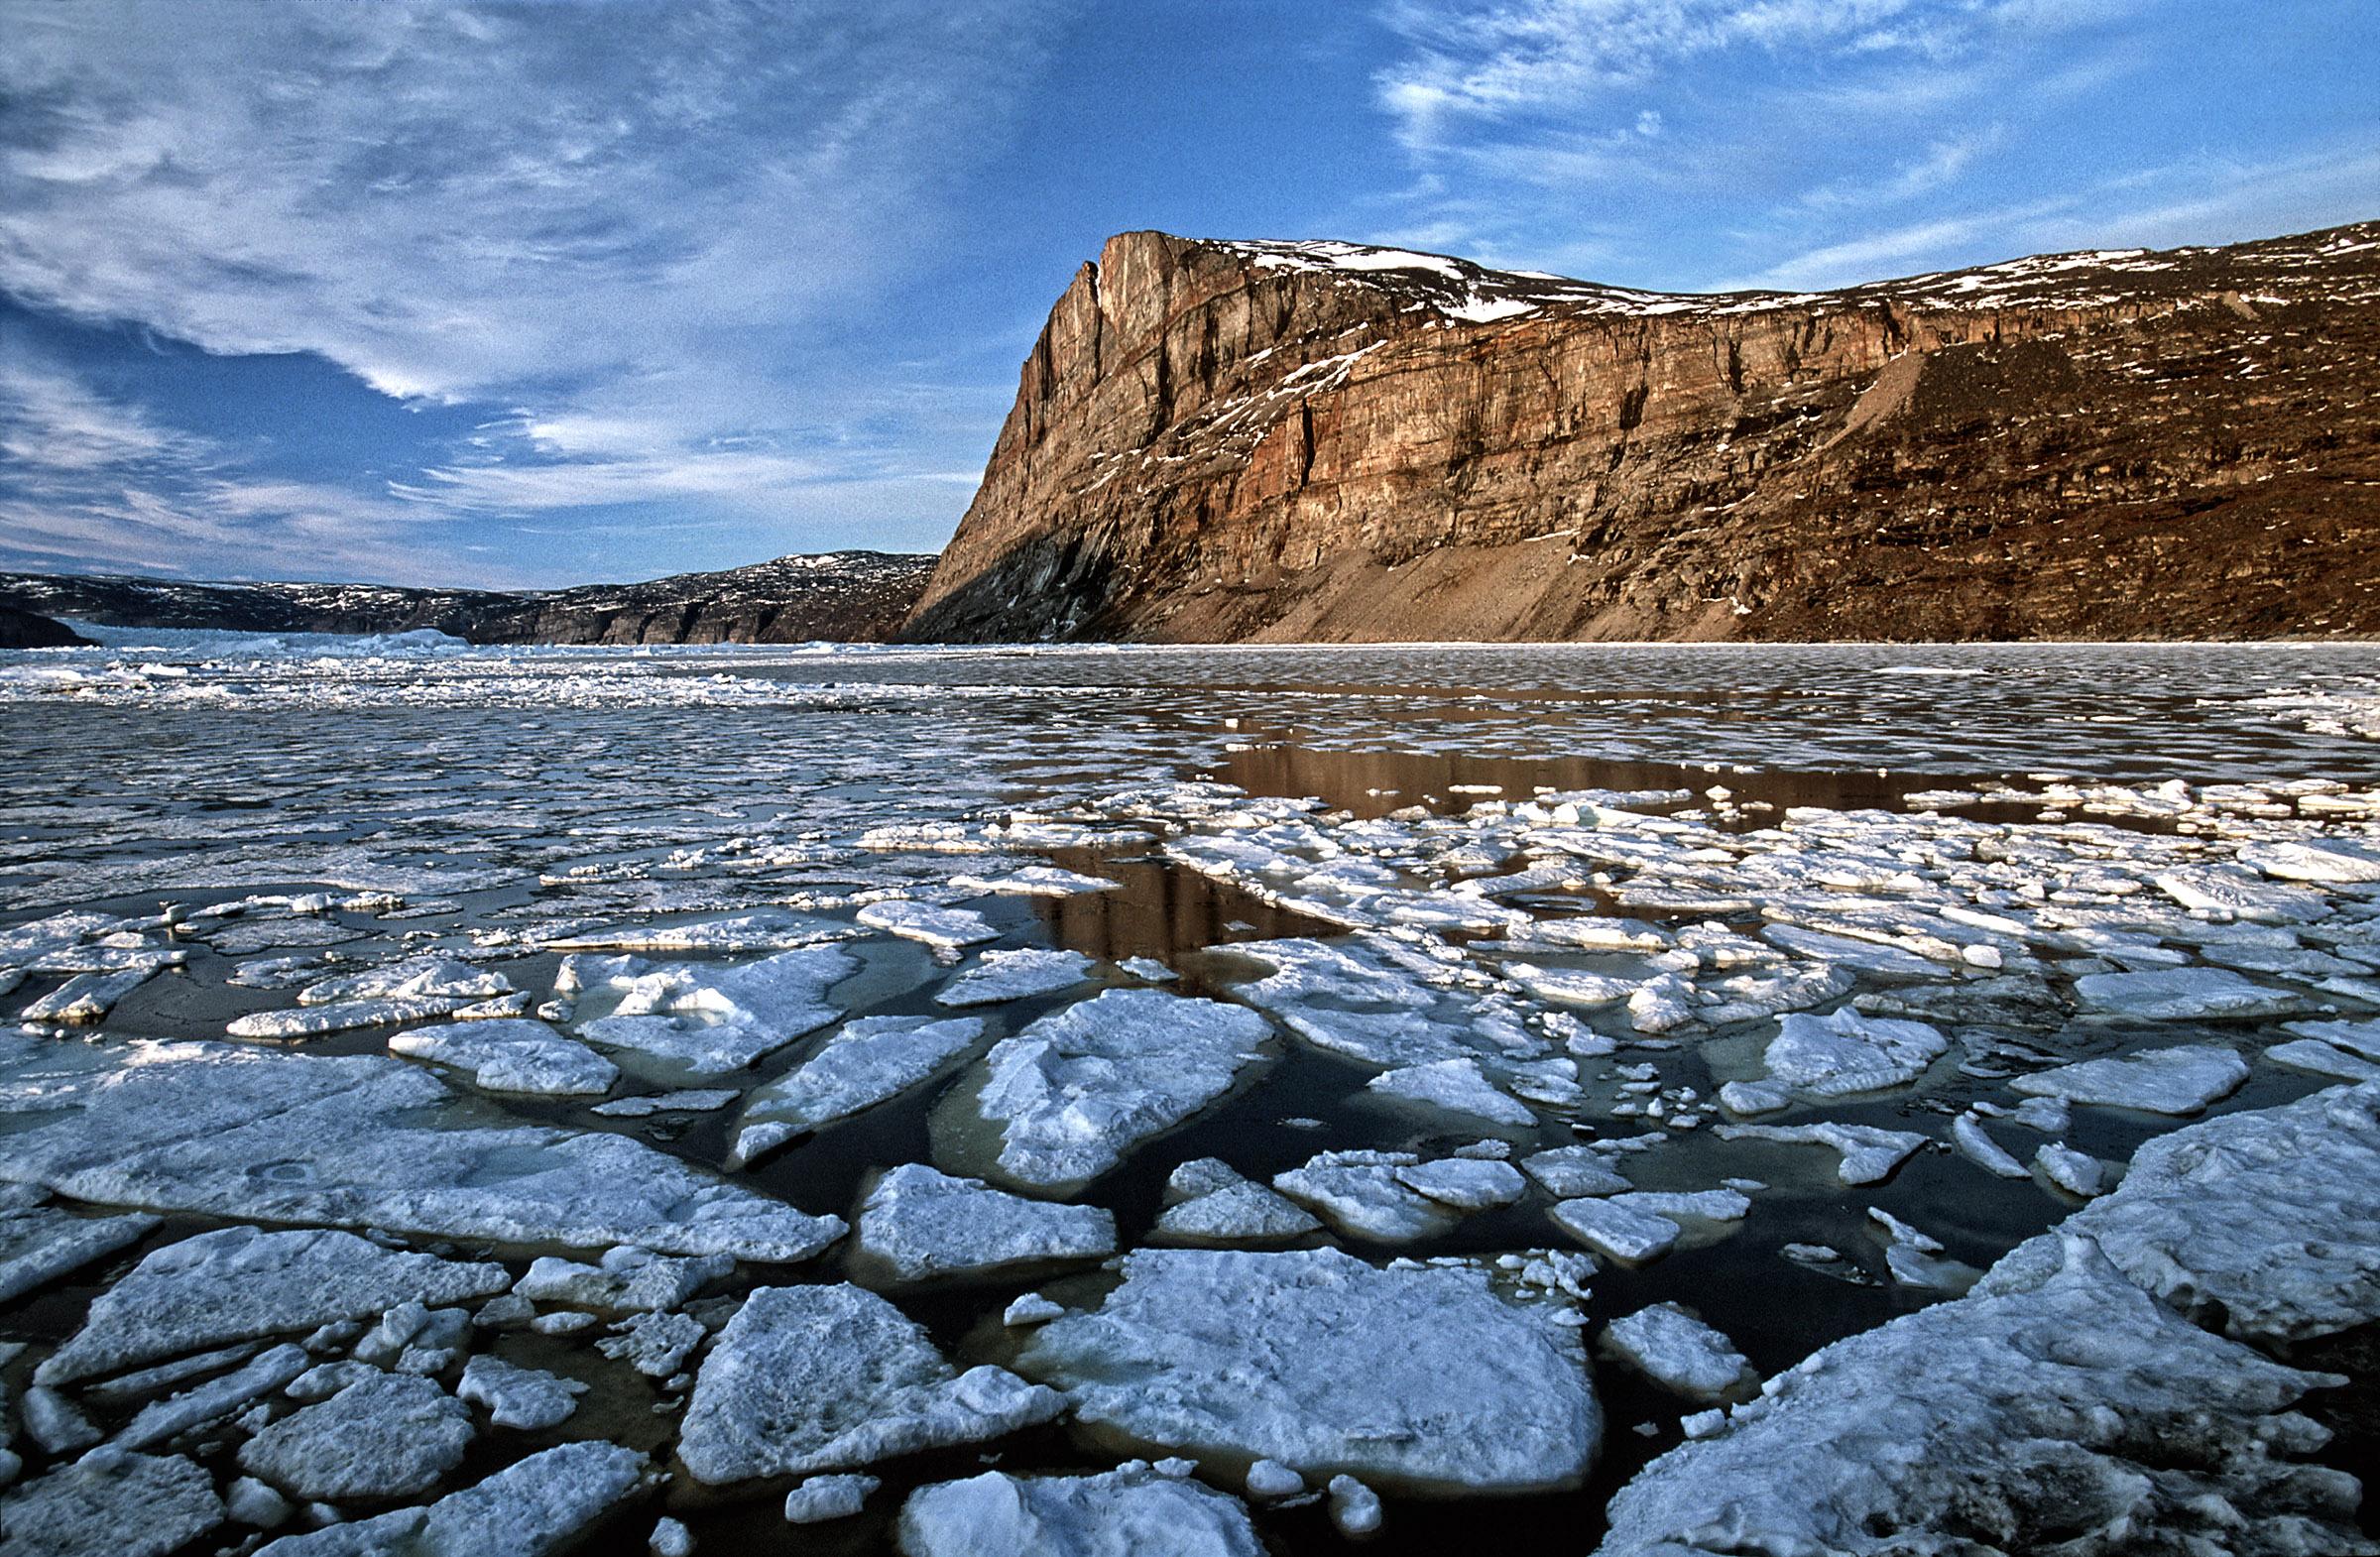 greenland-sea-pack-ice-mountain